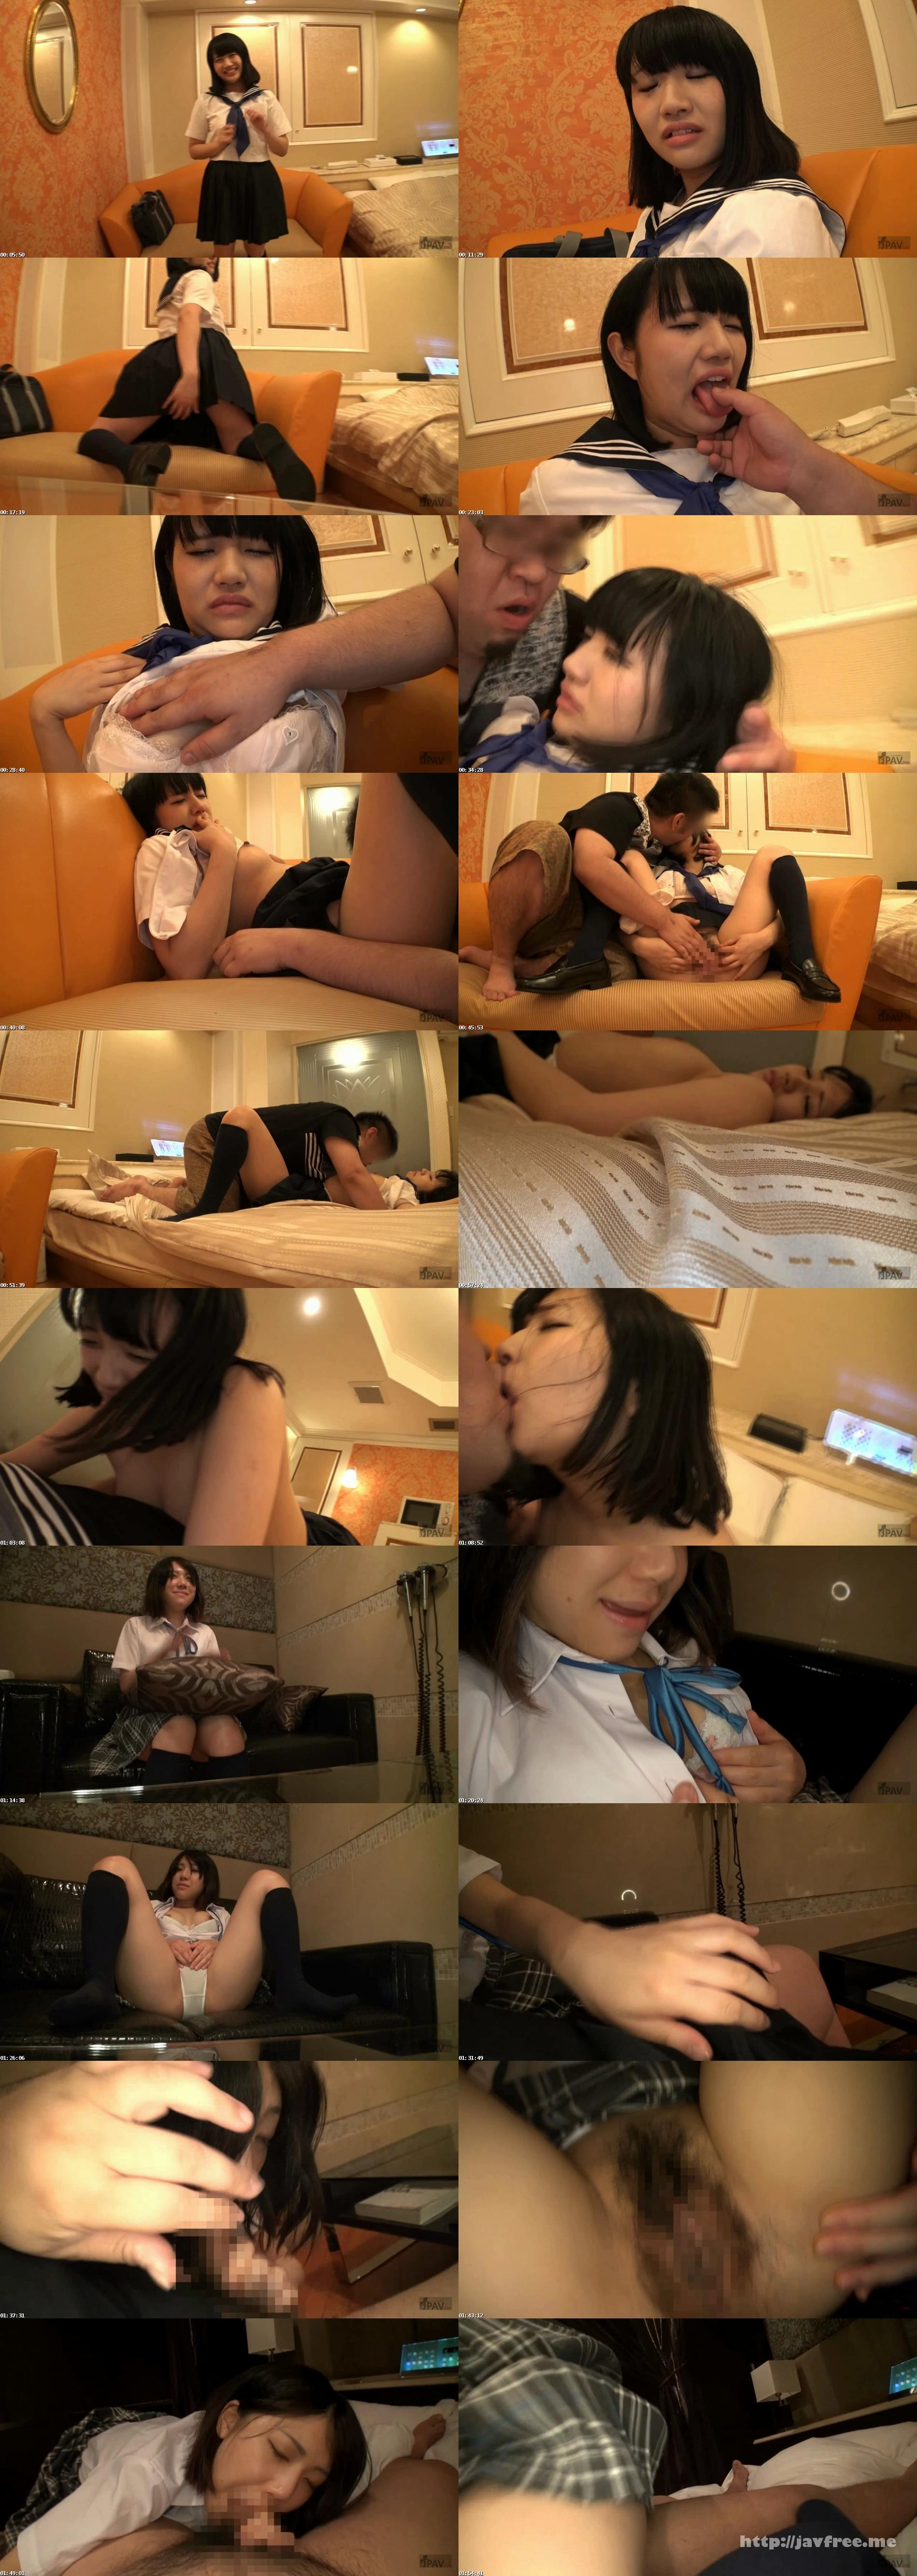 [OYJ 022] 未●年アイドル新鮮子宮に中出し処女デビュー デビュー前の激レアオマ●コを強制使用 アイドルの卵2名 OYJ